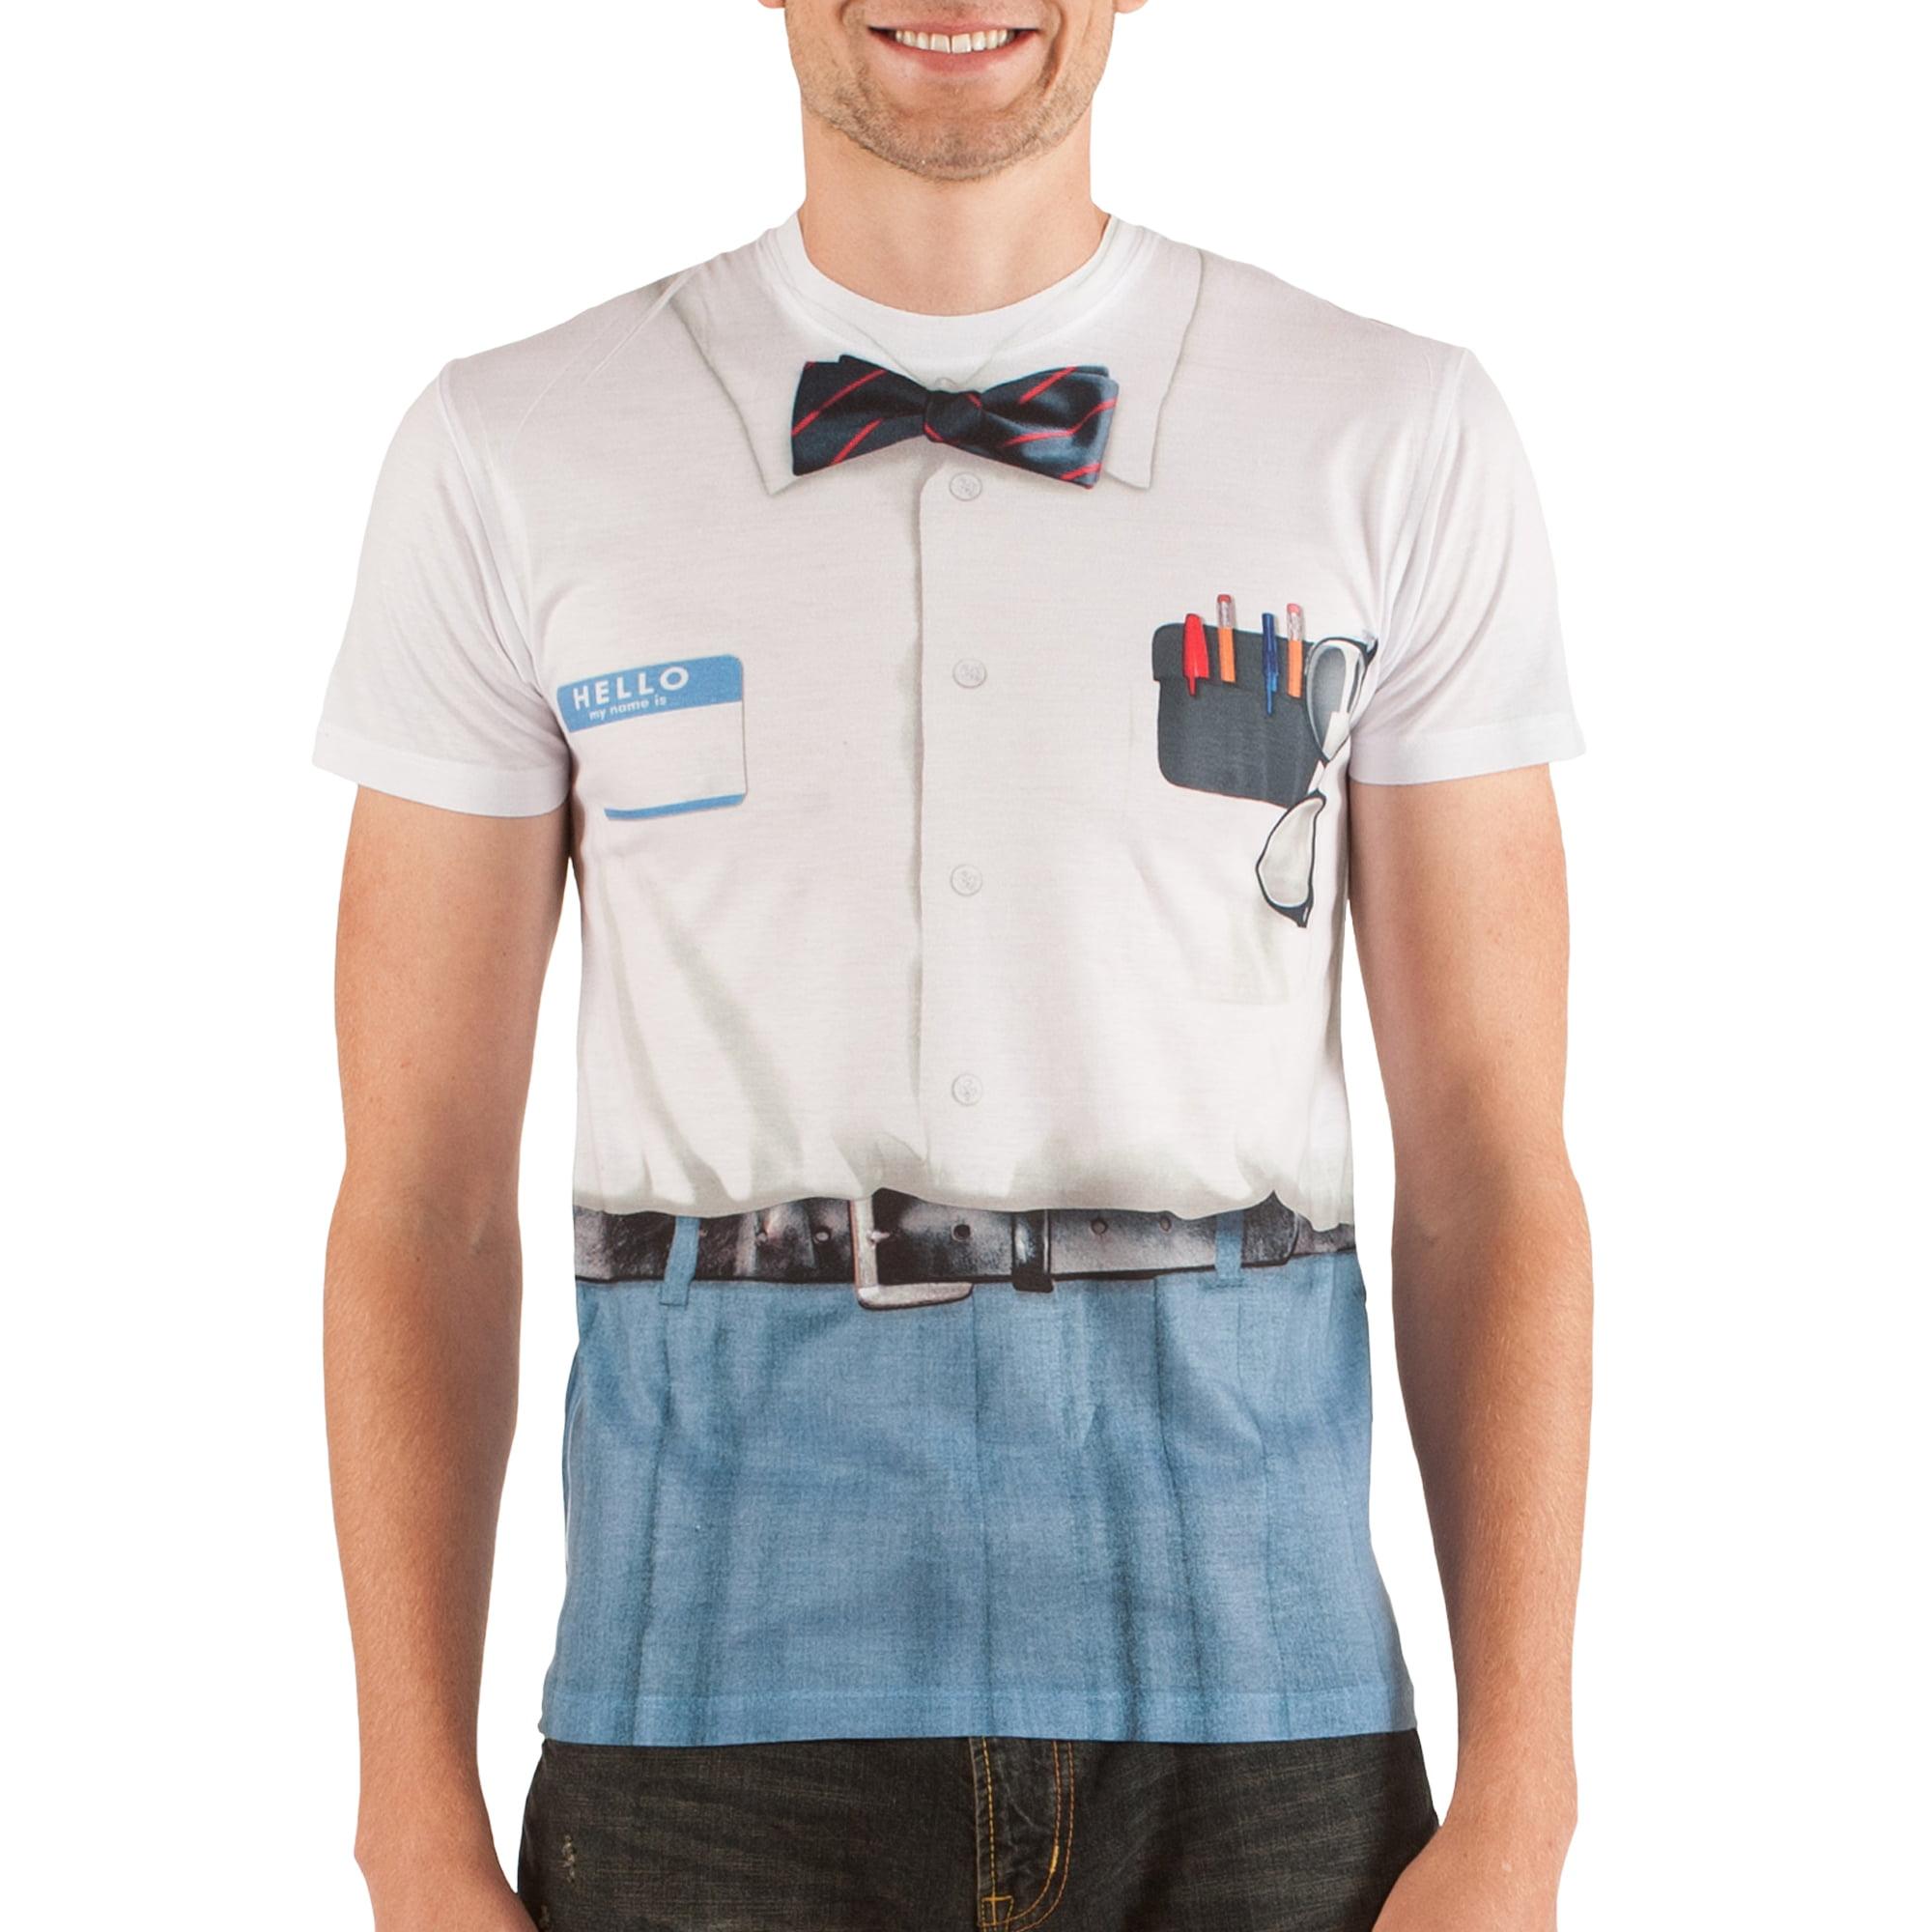 Nerd Men's Short Sleeve Tee Shirt